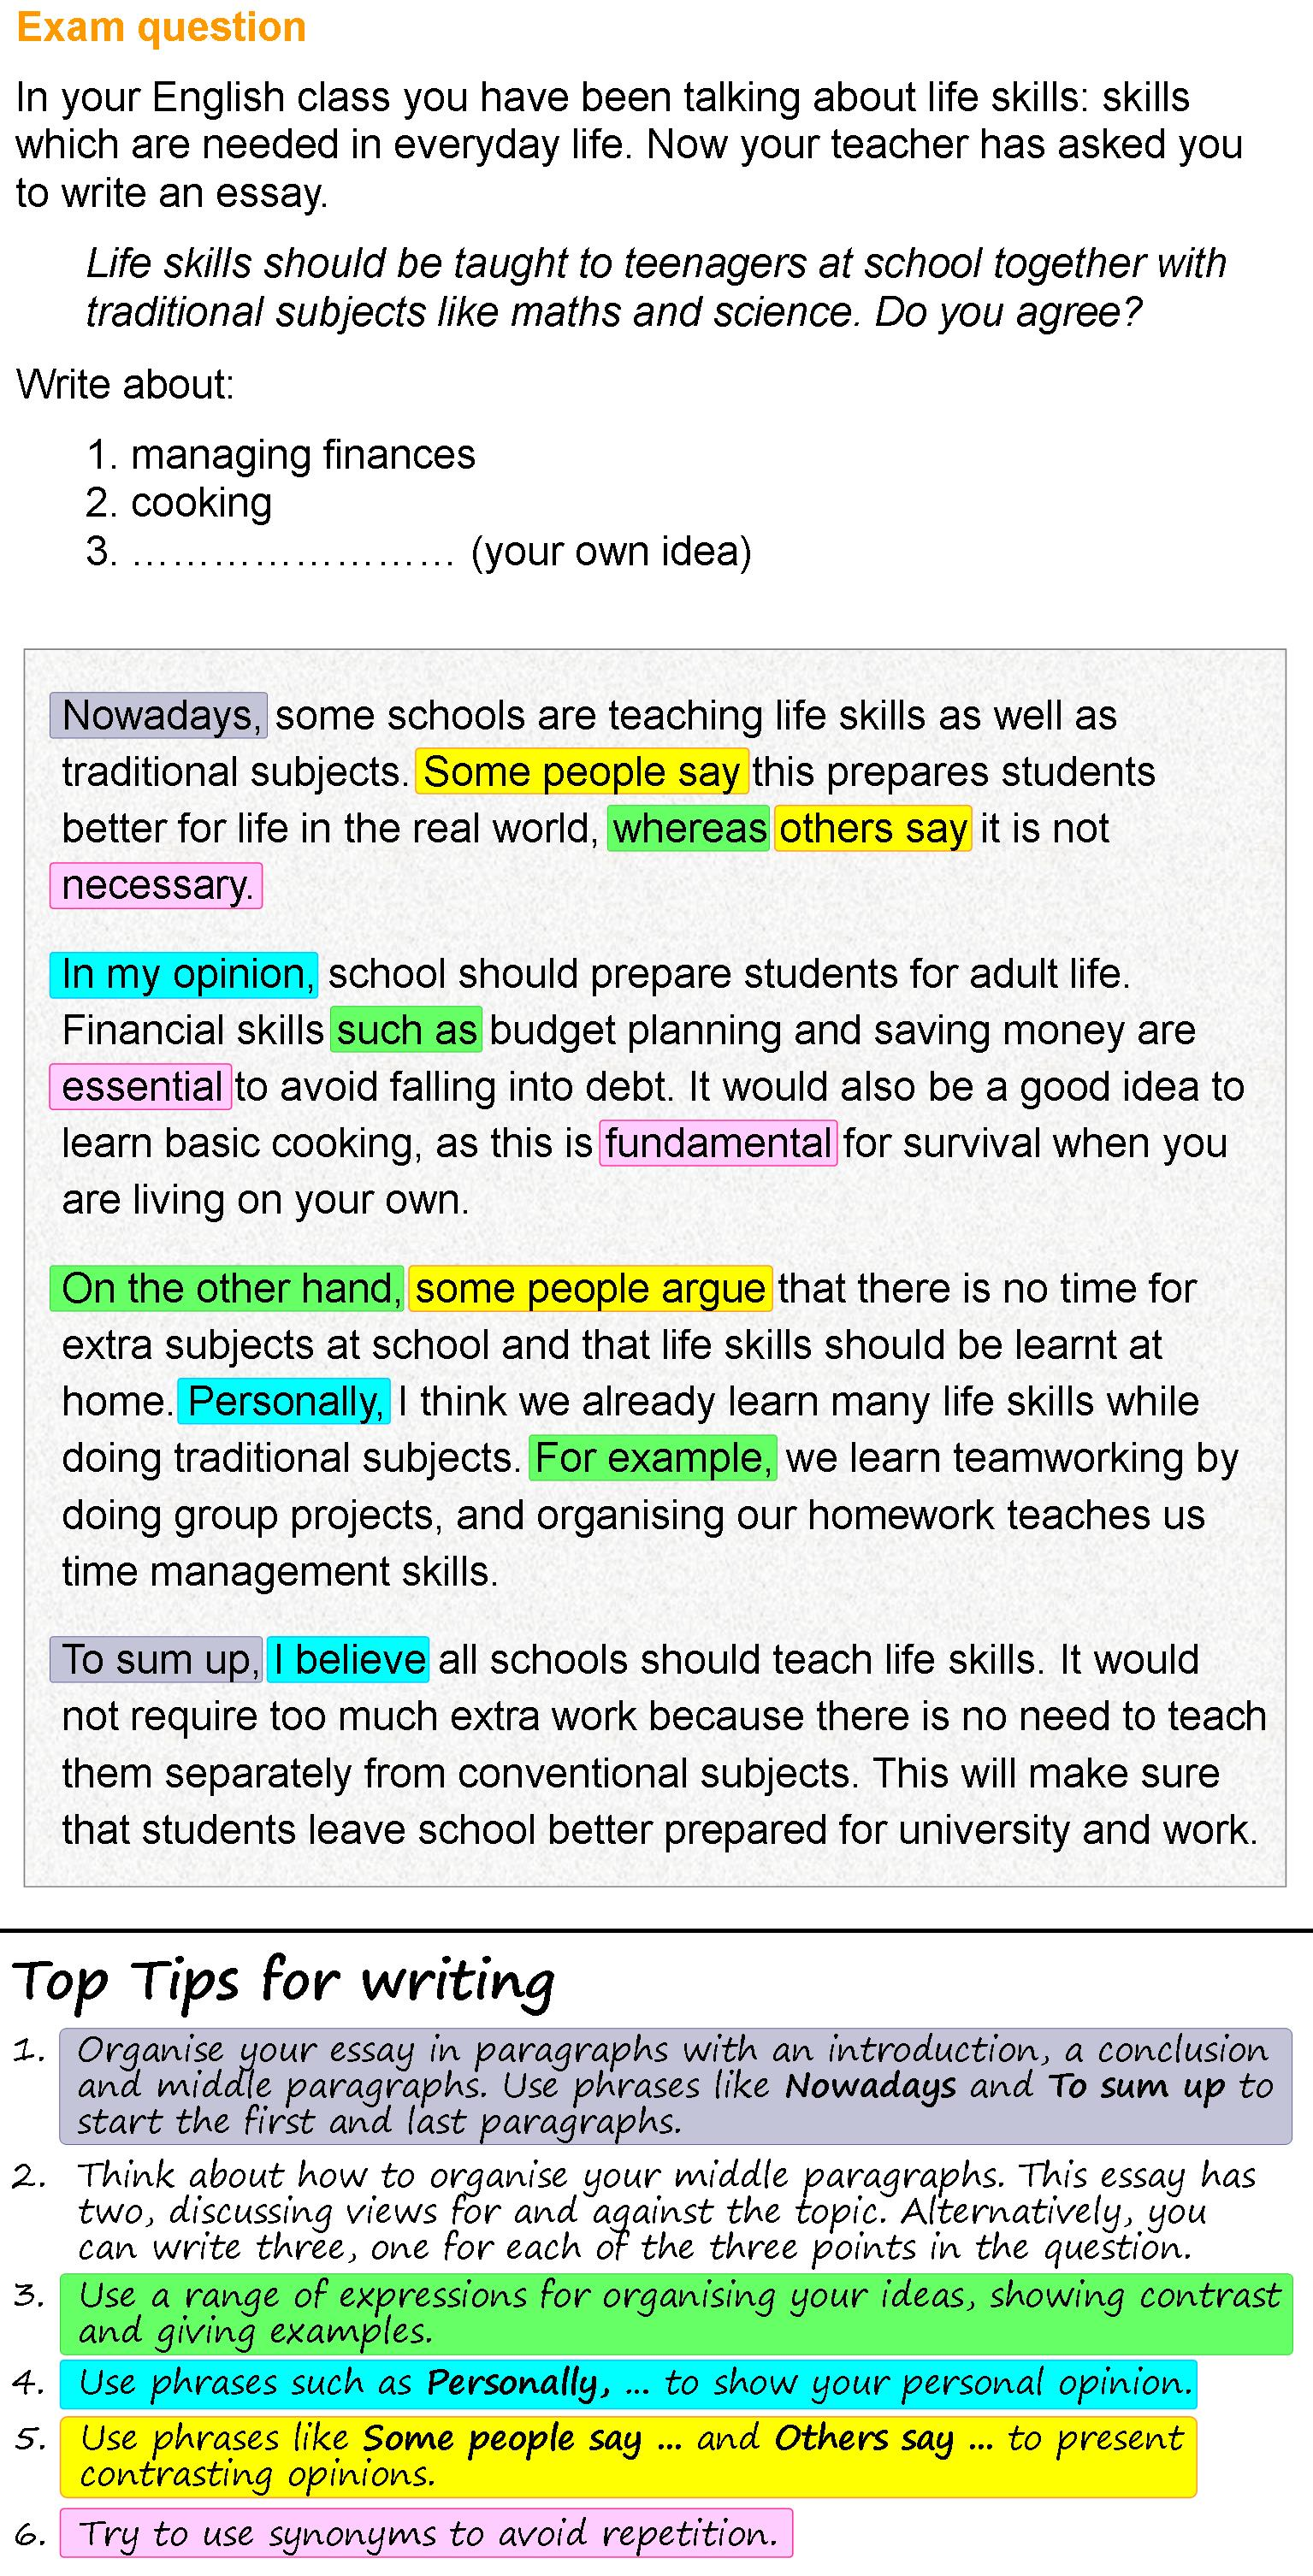 a life_skills_essay_1.jpg